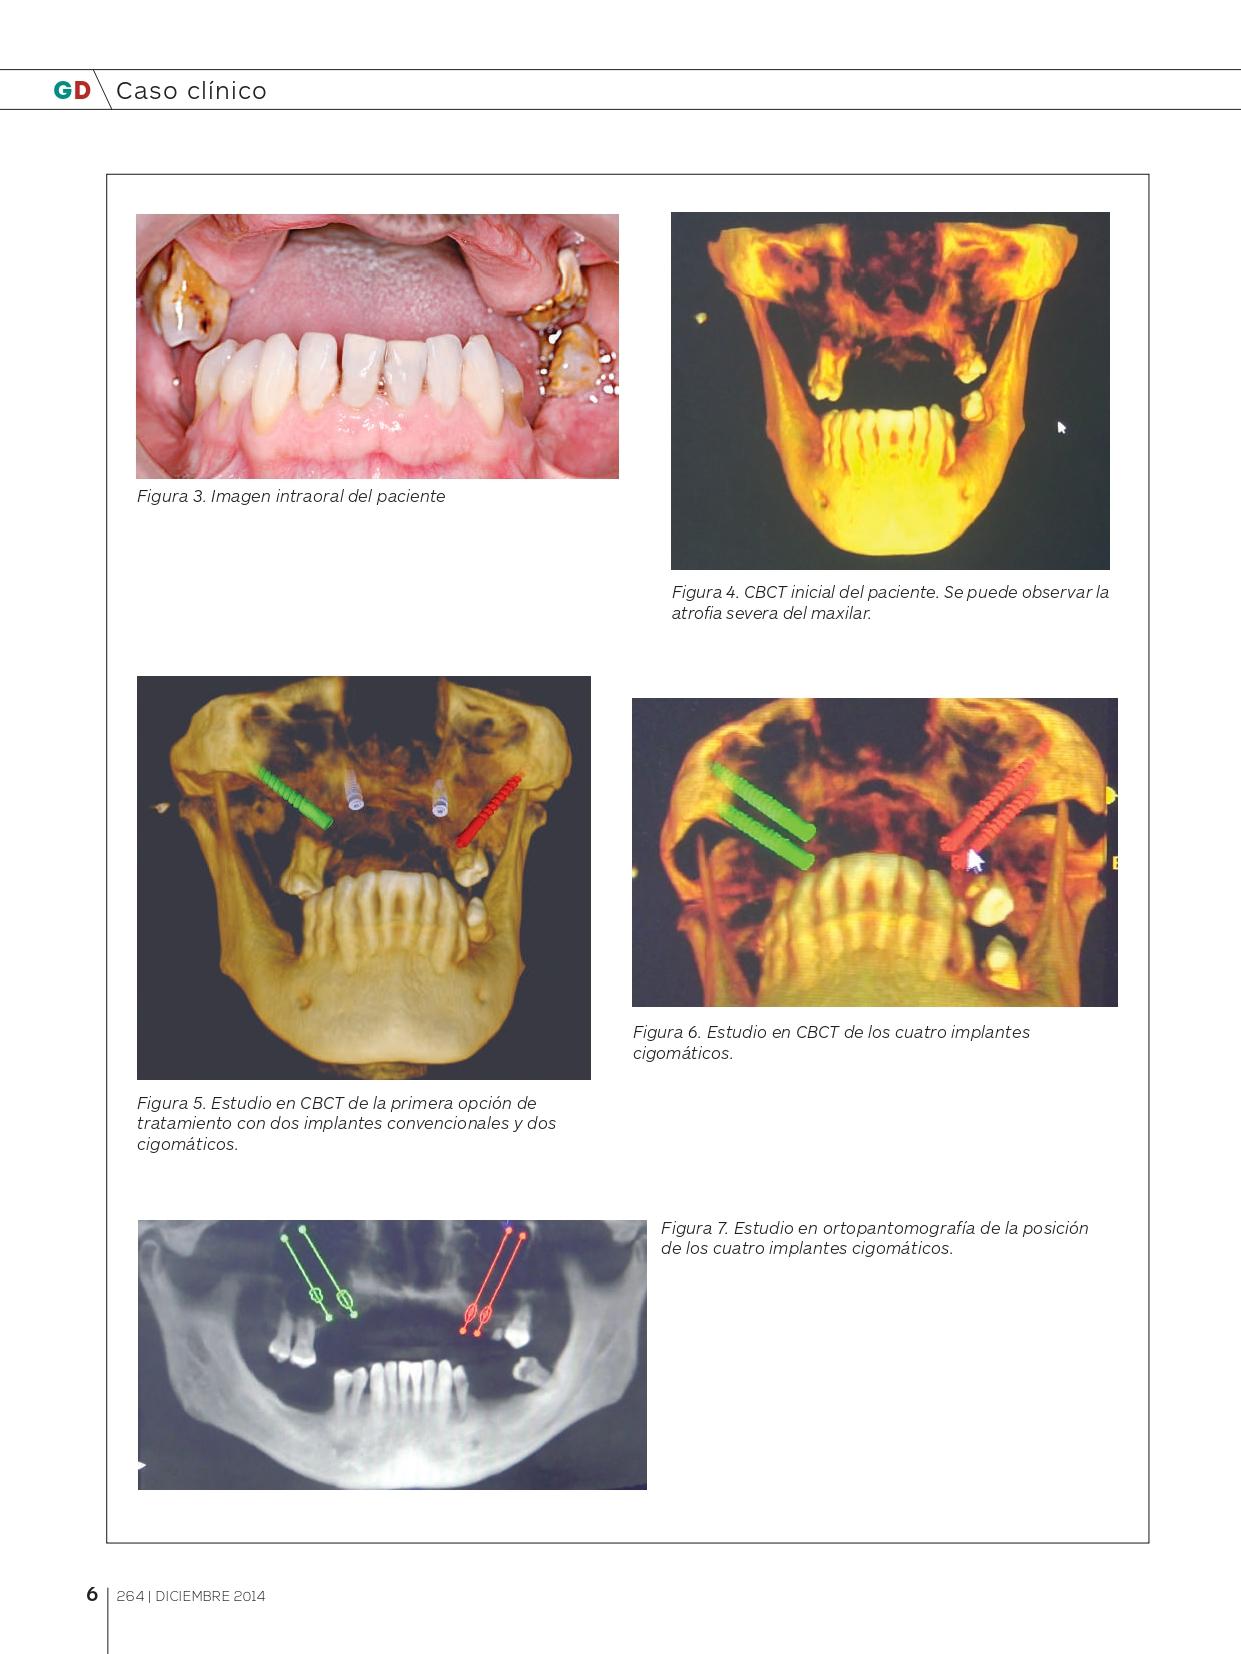 Rehabilitación-maxilar-completa-con-reabsorción-ósea-mediante-4-implantes-cigomáticos_page-0004